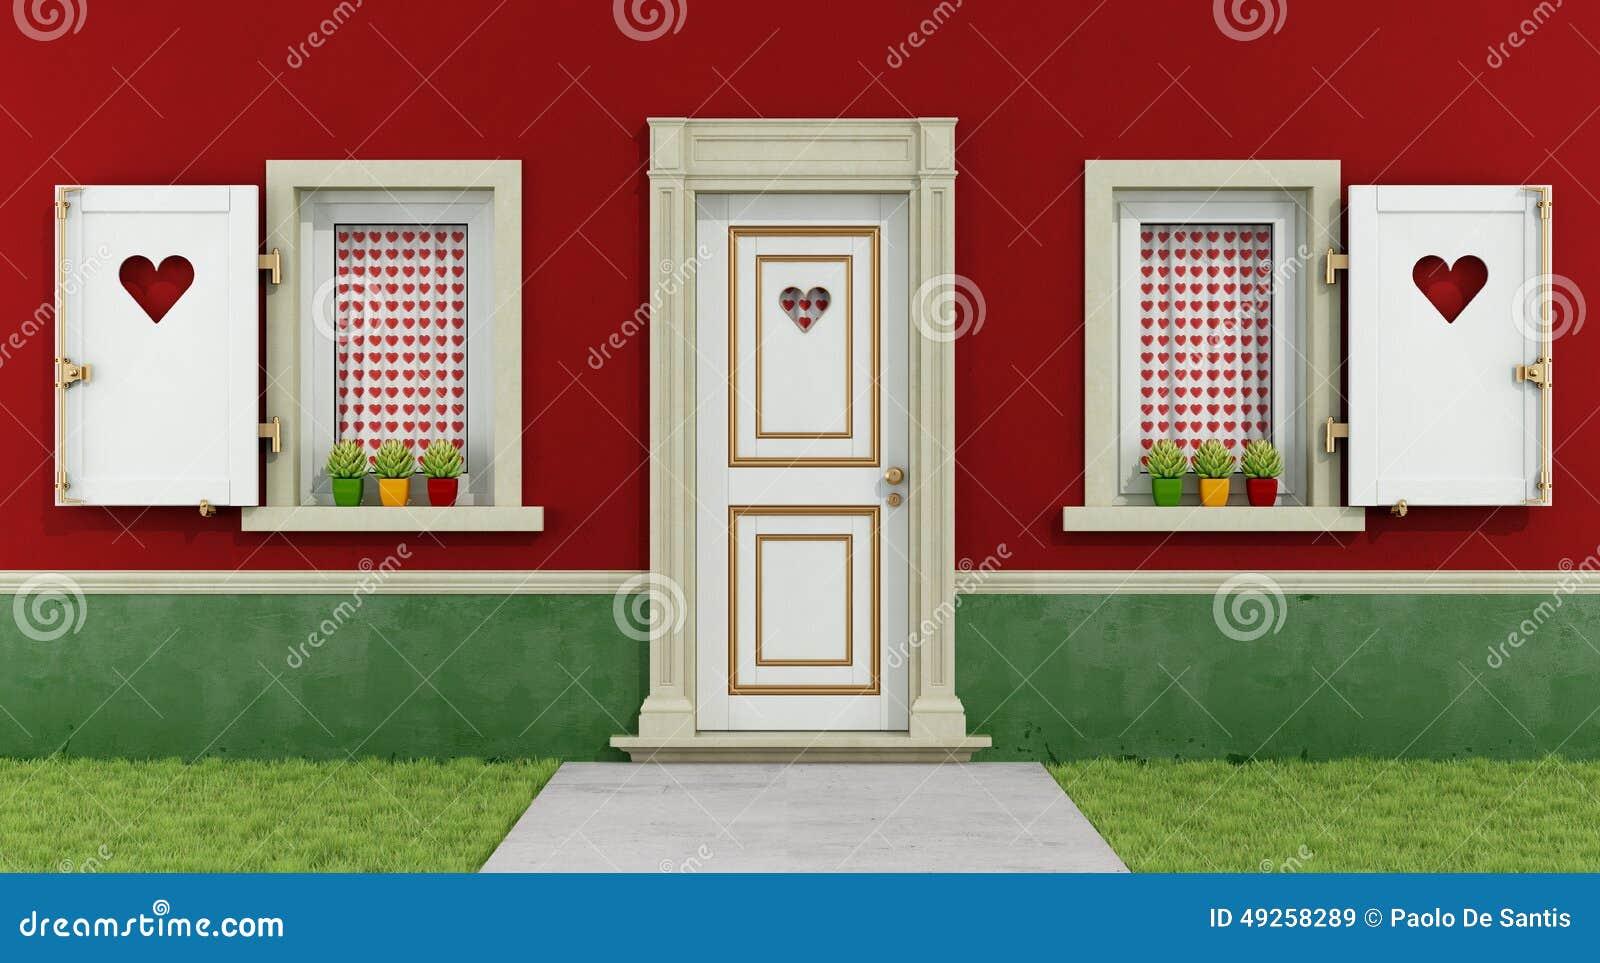 Love house & Love house stock illustration. Illustration of vintage - 49258289